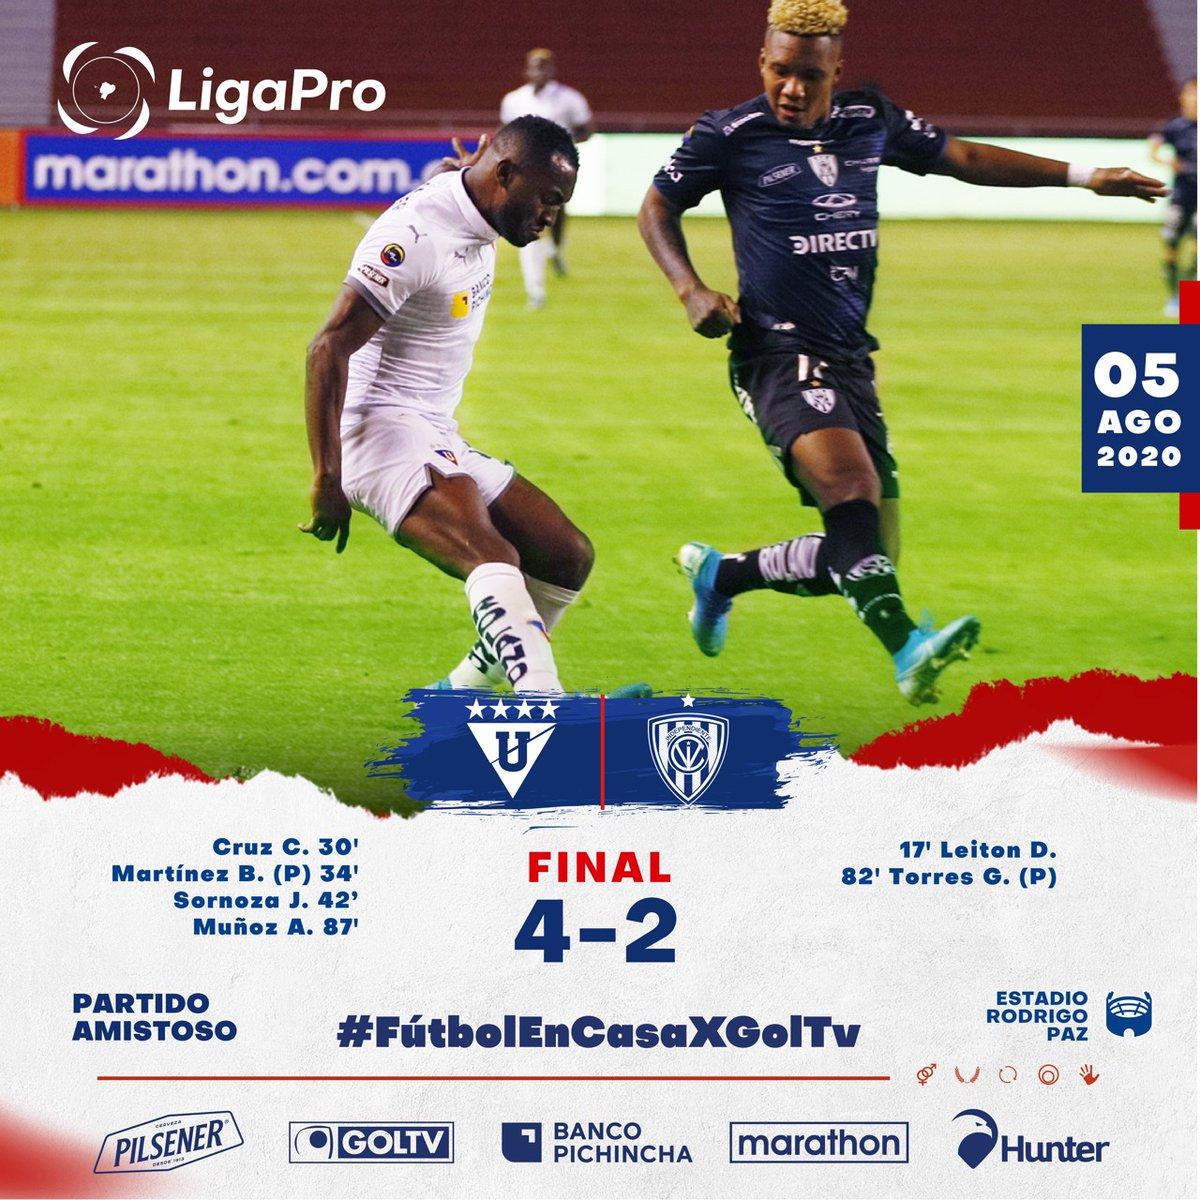 ¡Marcador Final!  #LigaPro   Amistoso ⠀   Estadio Rodrigo Paz Delgado ⠀ #LDU #IDV (-)⠀  Goles: #LDU: Cruz (30'), Martínez (34') -P, Sornoza (42'), Muñoz (87') #IDV: Leiton (17'), Torres (81') - P ⠀  #LigaPro  #GanamosTodos #LDU #IDVpic.twitter.com/DJ9S9XwkS3